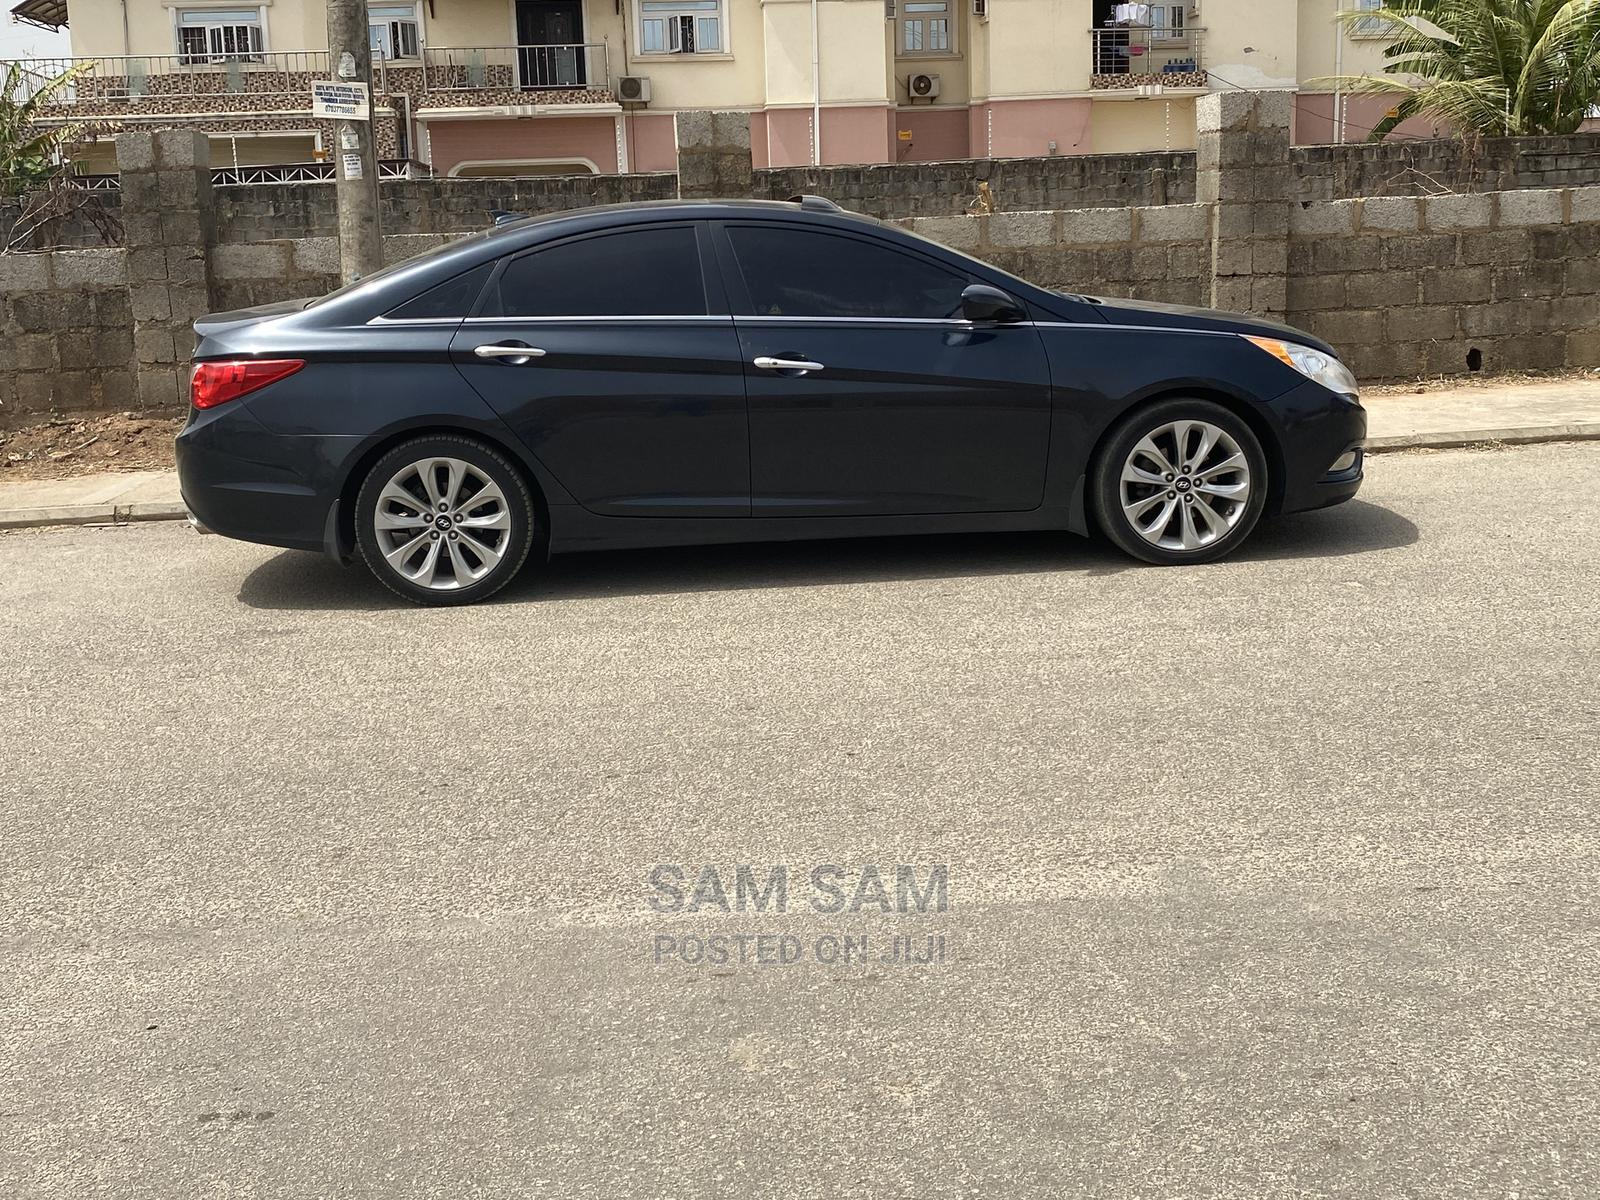 Hyundai Sonata 2012 Blue | Cars for sale in Kubwa, Abuja (FCT) State, Nigeria